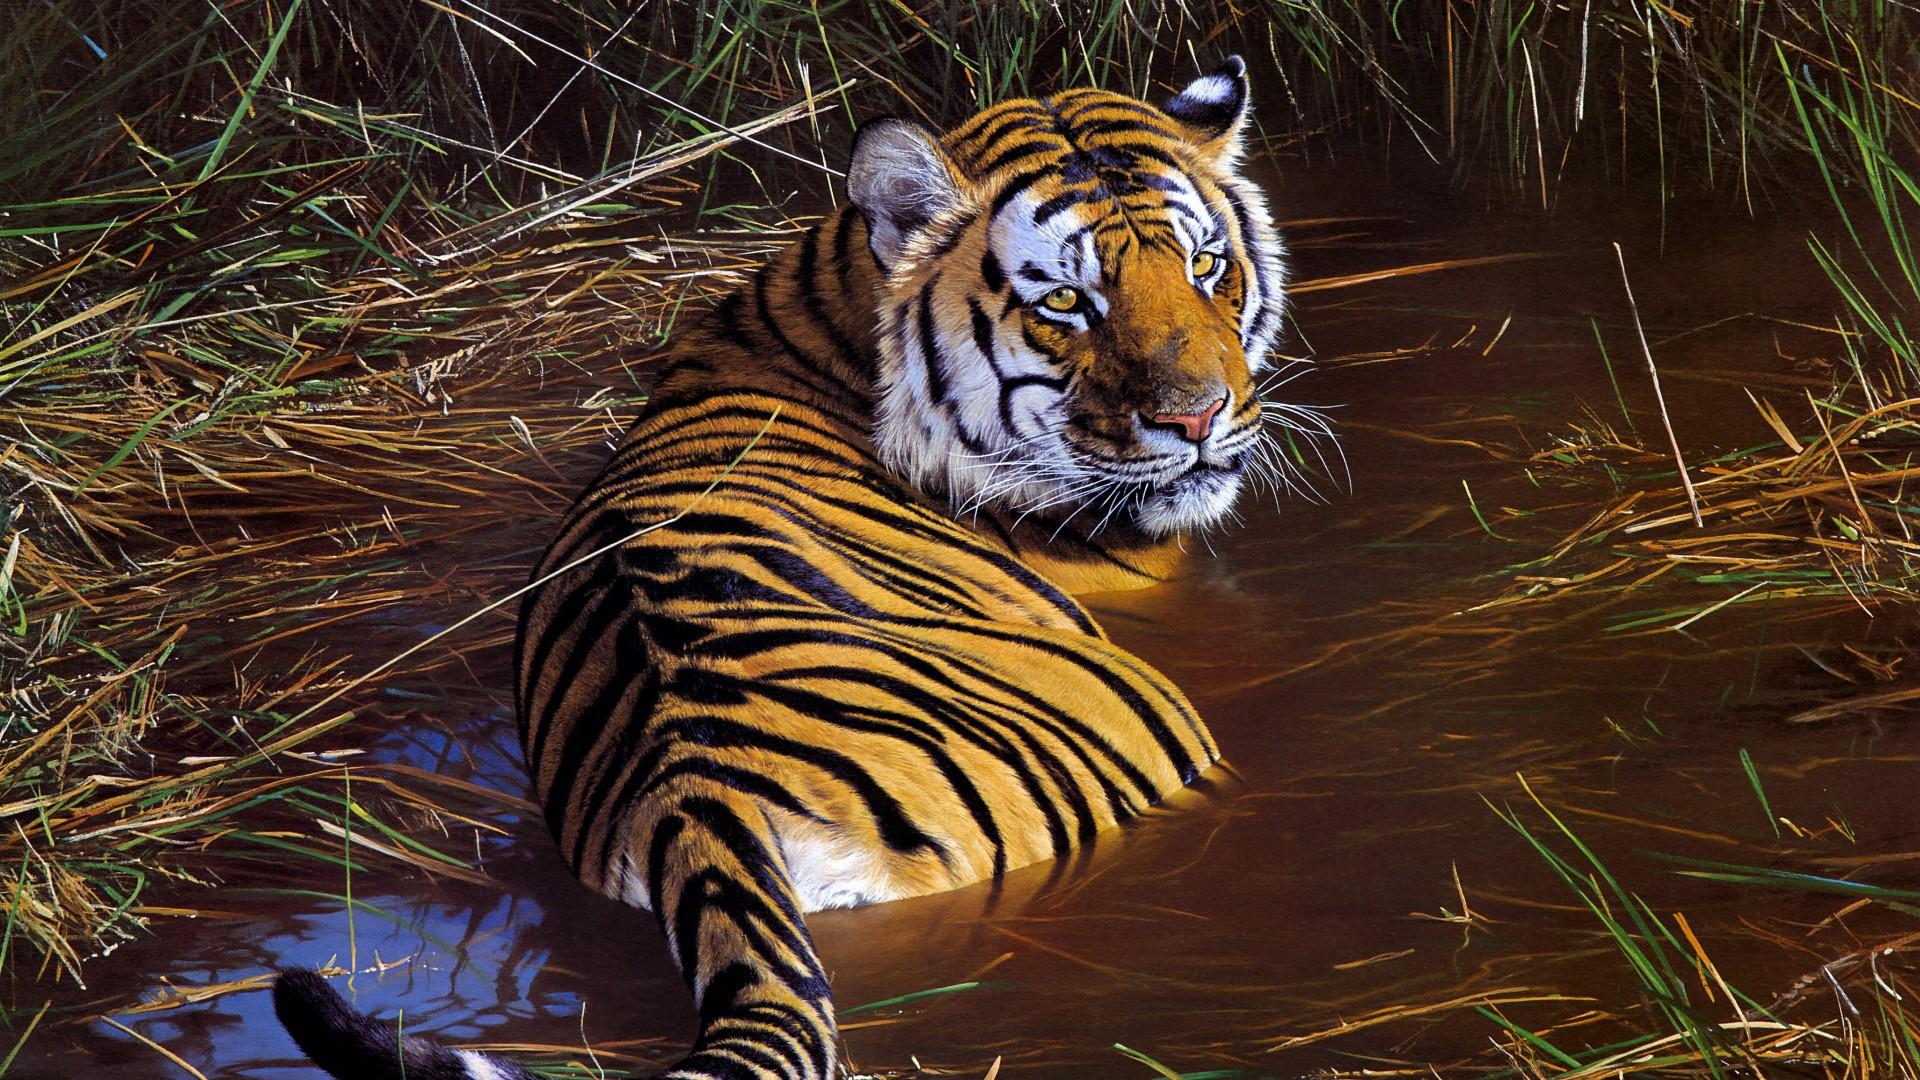 Leopard Wallpaper Iphone Tiger Wildlife Artwork 4k Wallpapers Hd Wallpapers Id